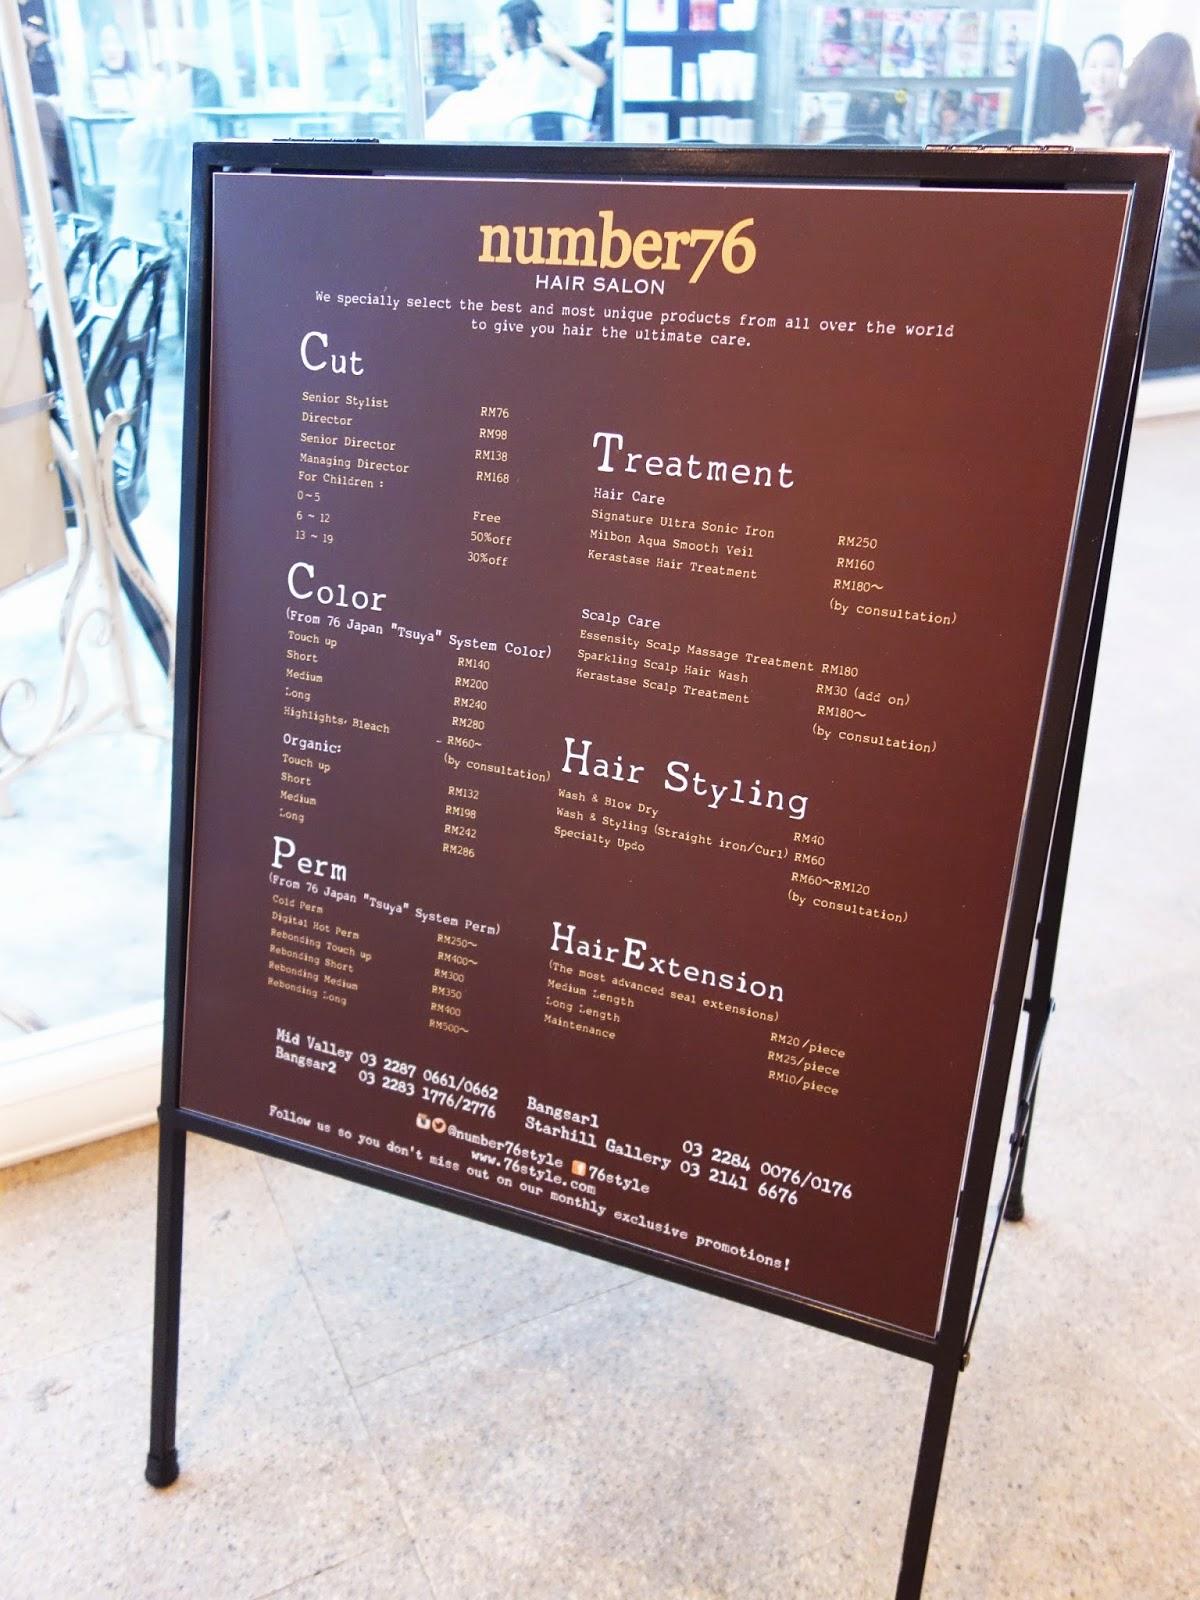 Number 76 style k rastase sensidote for 76 salon mid valley